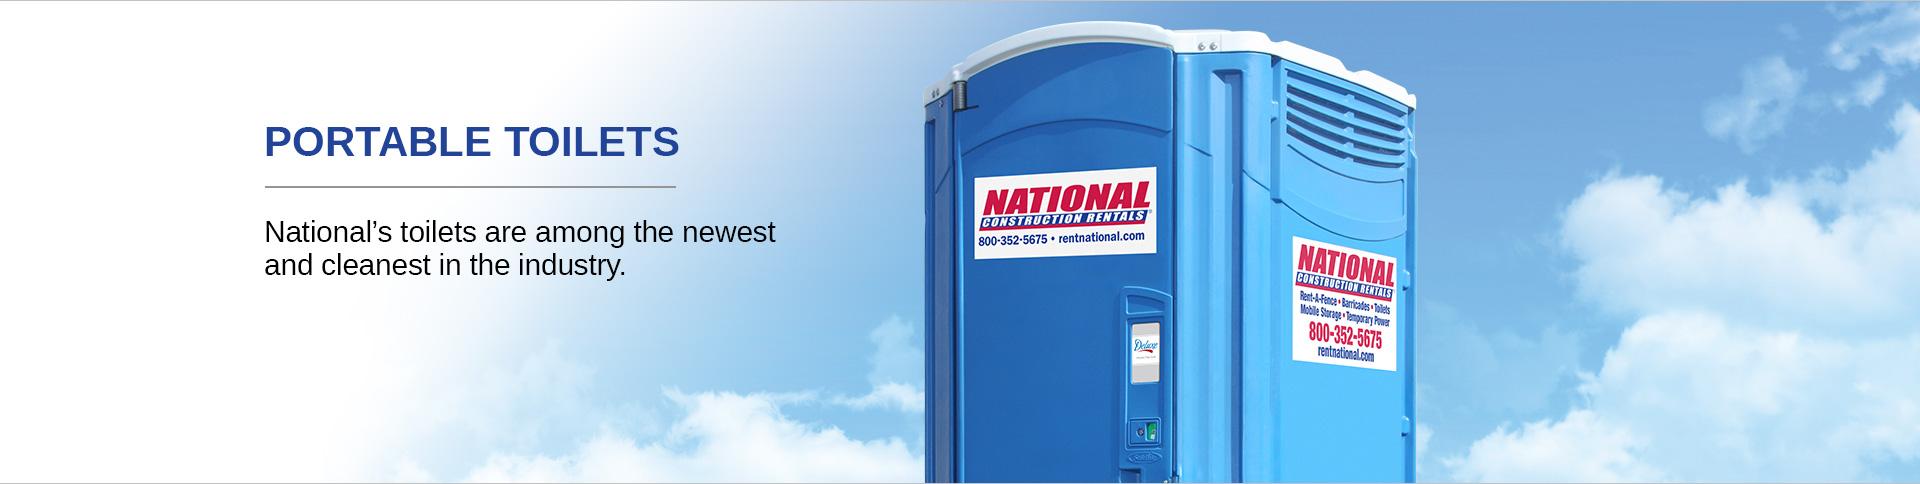 Portable Sanitation Services : Rent portable toilets porta potty rentals national